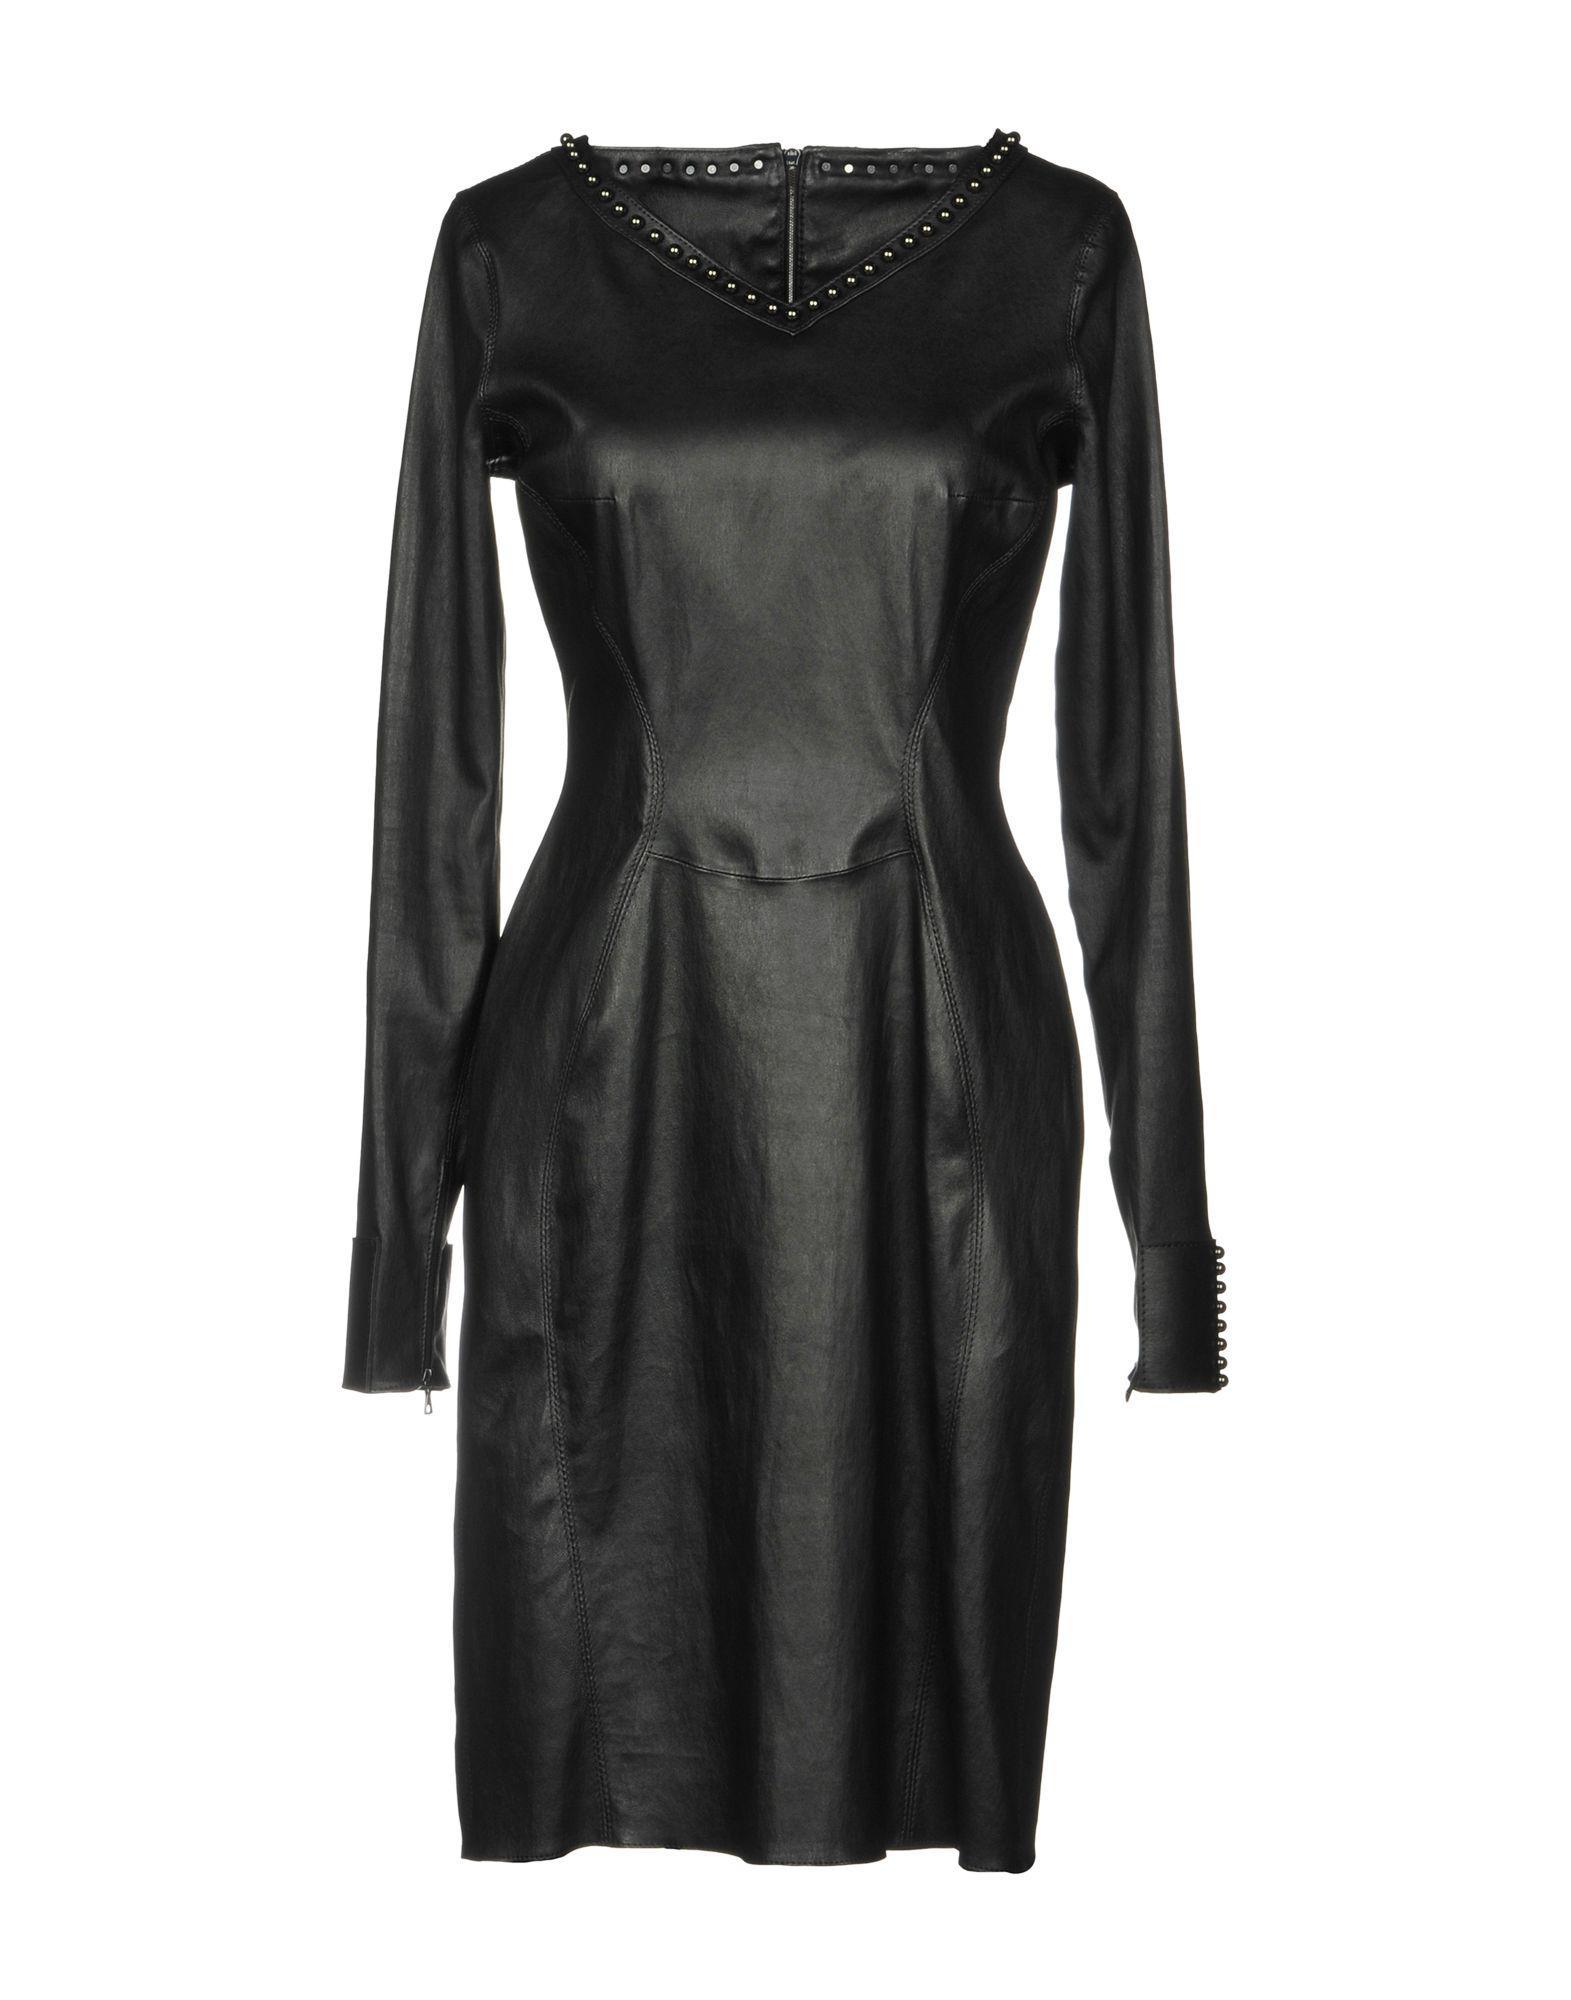 DRESSES - Short dresses Aphero Shopping sTTM11B